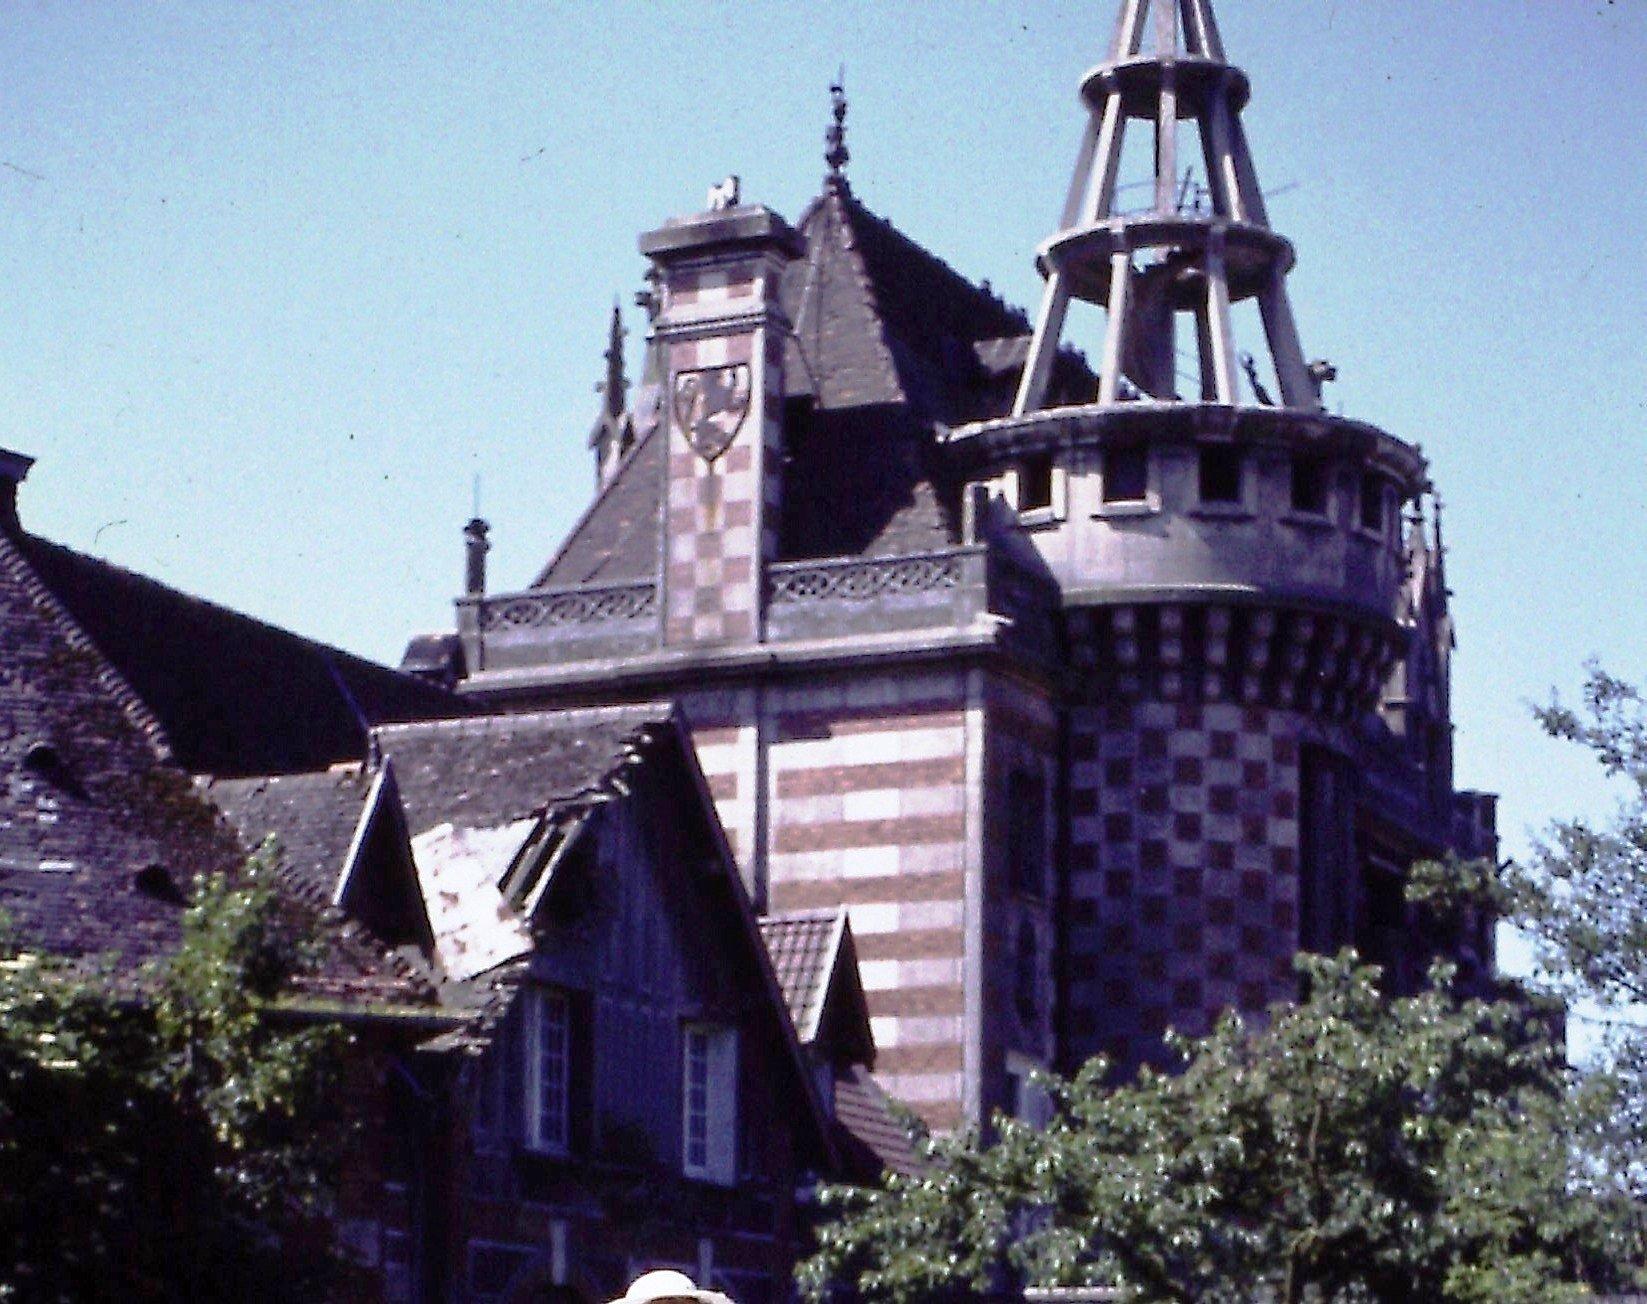 Famars-1981- Chateau Harpignies